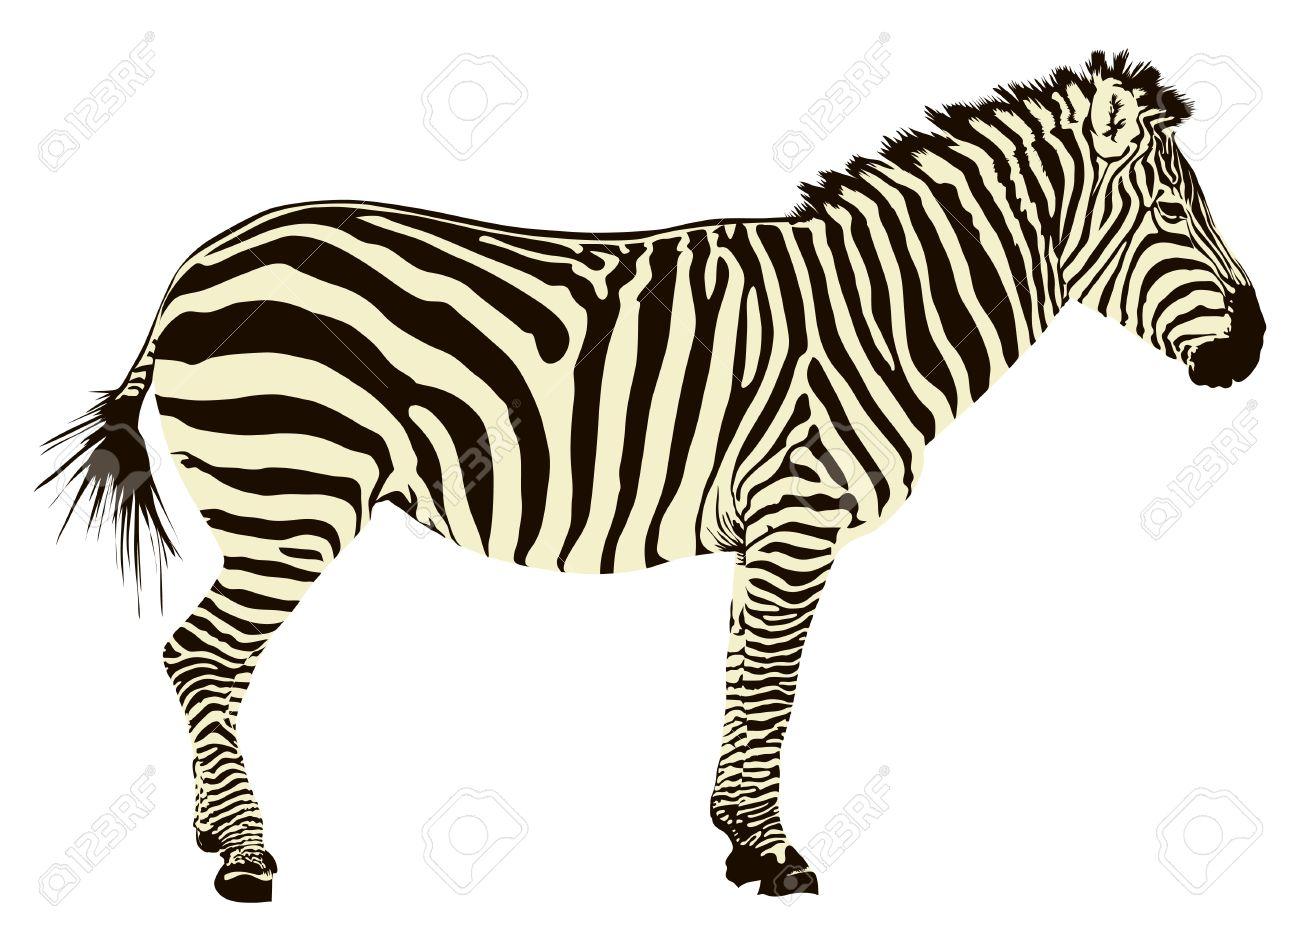 16,773 Zebra Cliparts, Stock Vector And Royalty Free Zebra.